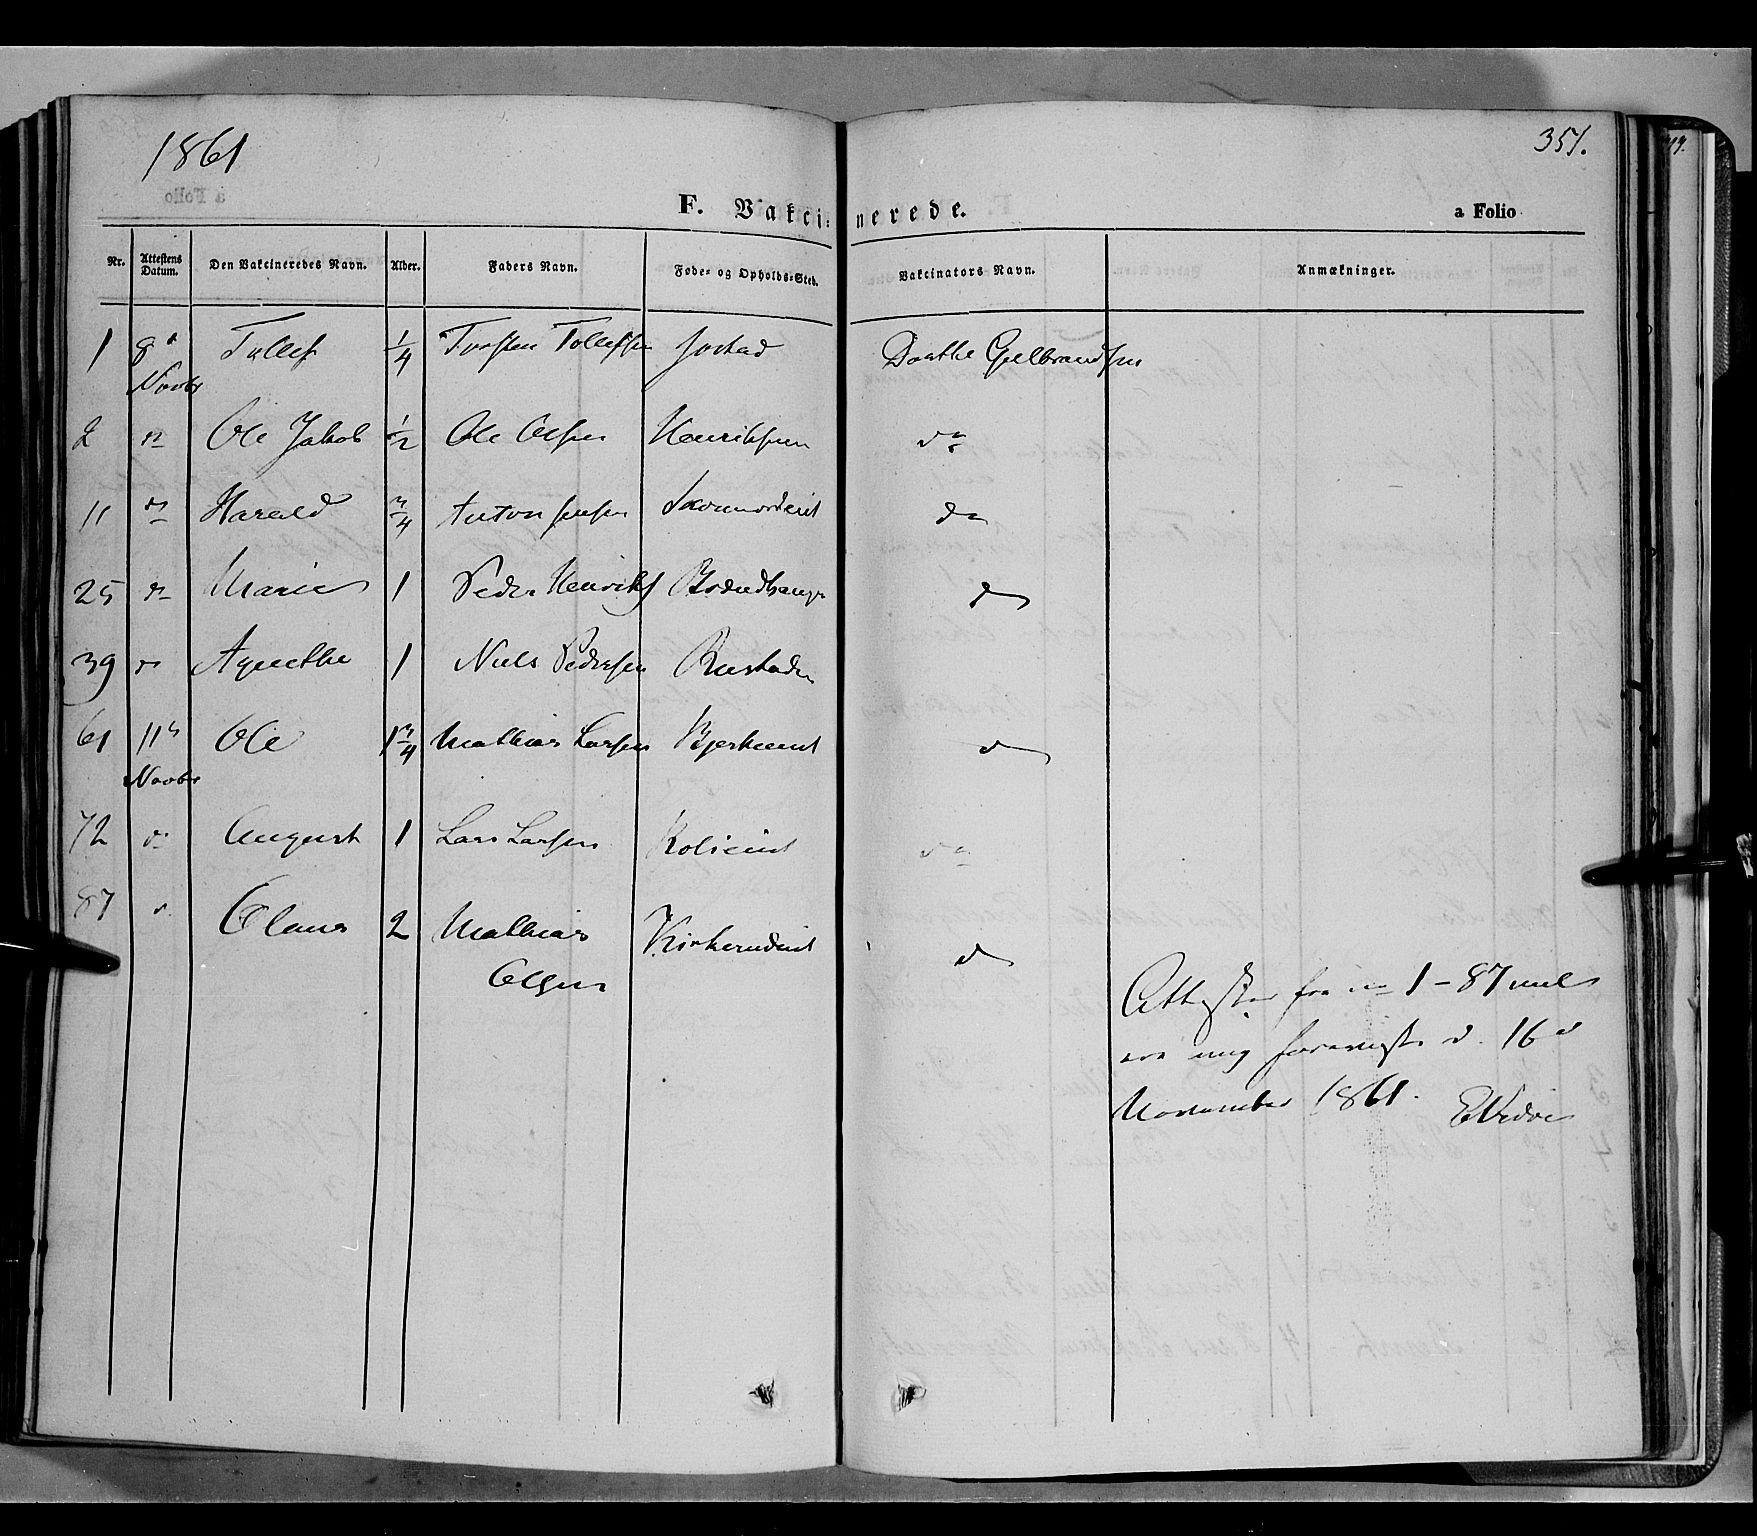 SAH, Biri prestekontor, Ministerialbok nr. 5, 1843-1854, s. 351